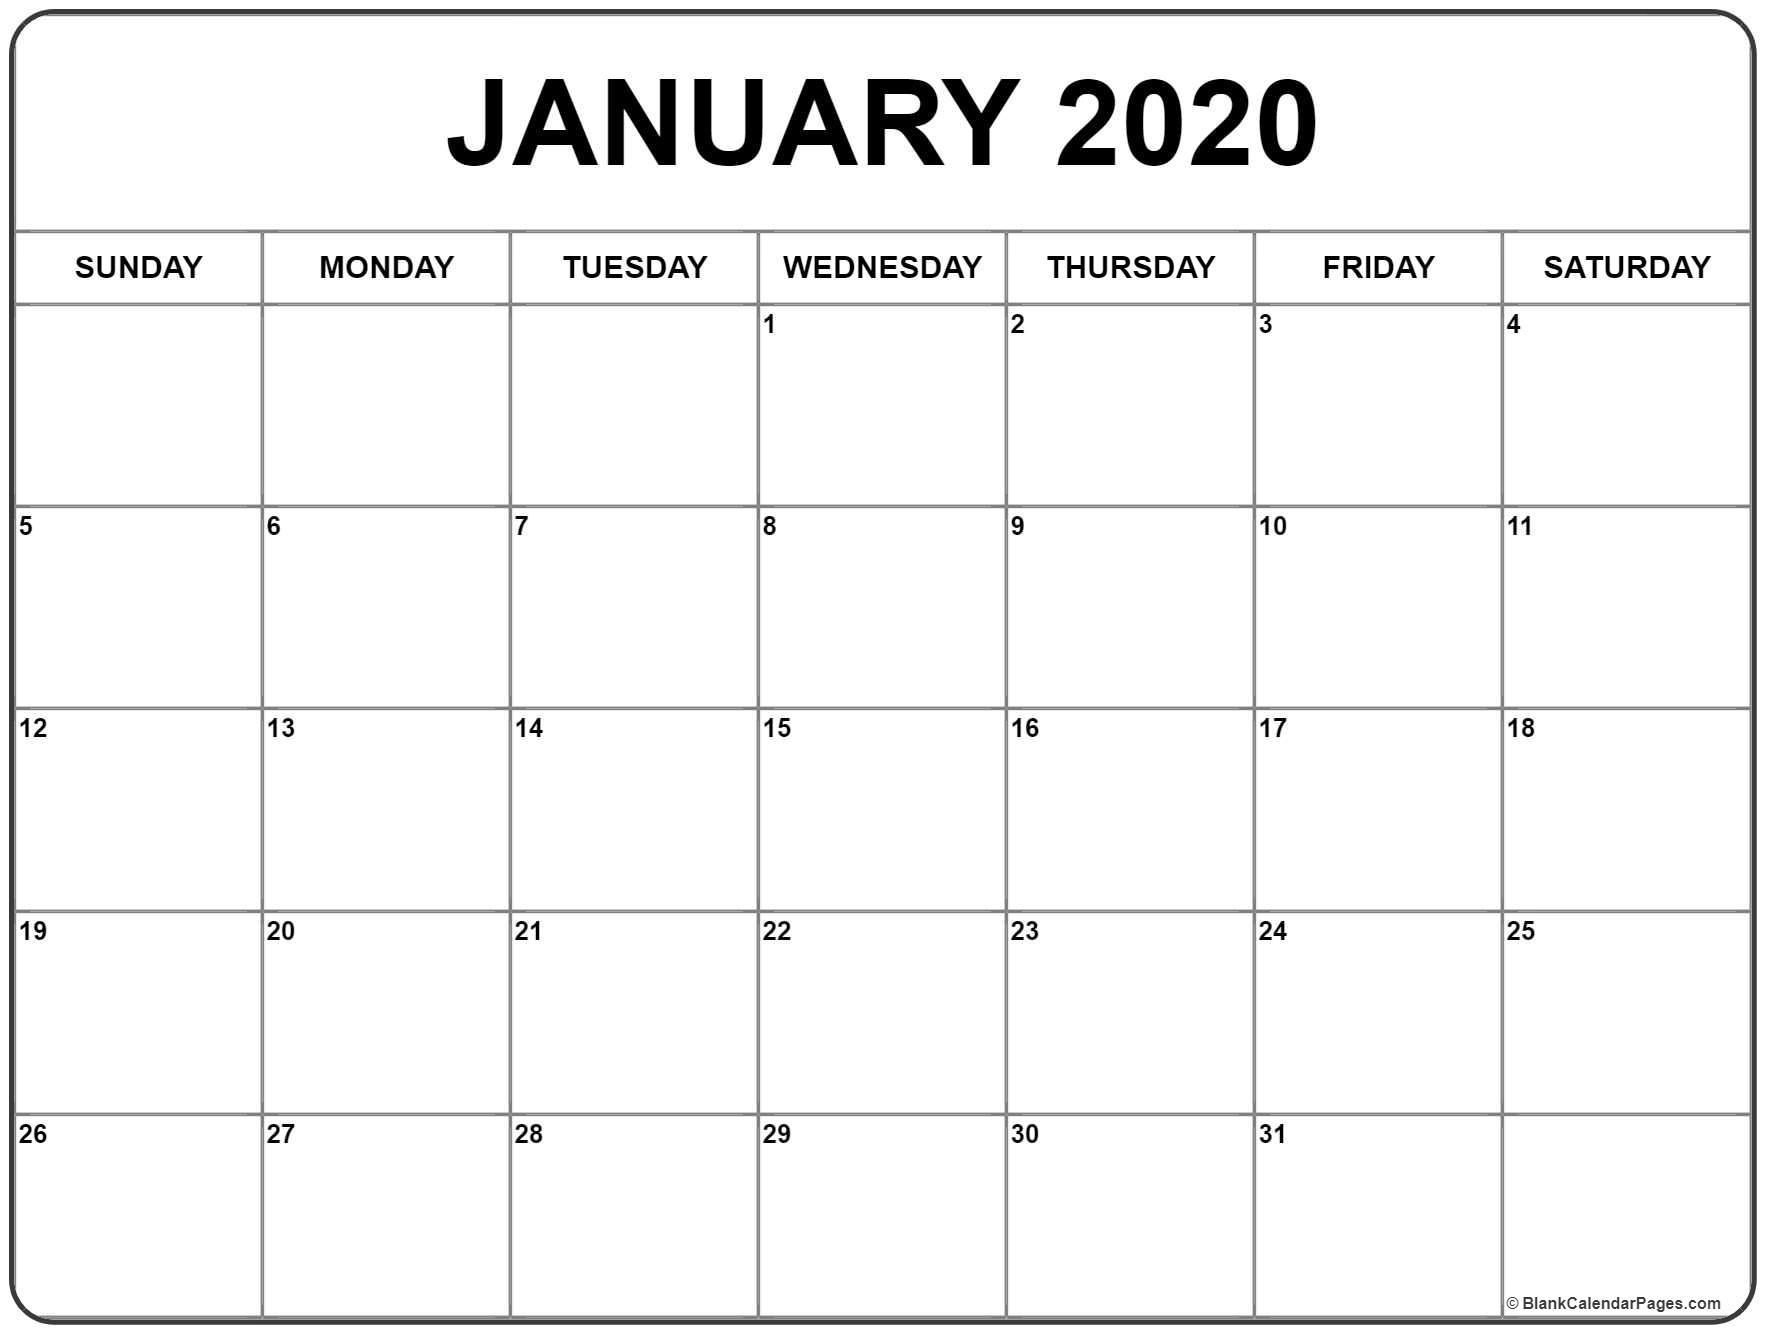 Free Blank 2020 Calendar - Togo.wpart.co